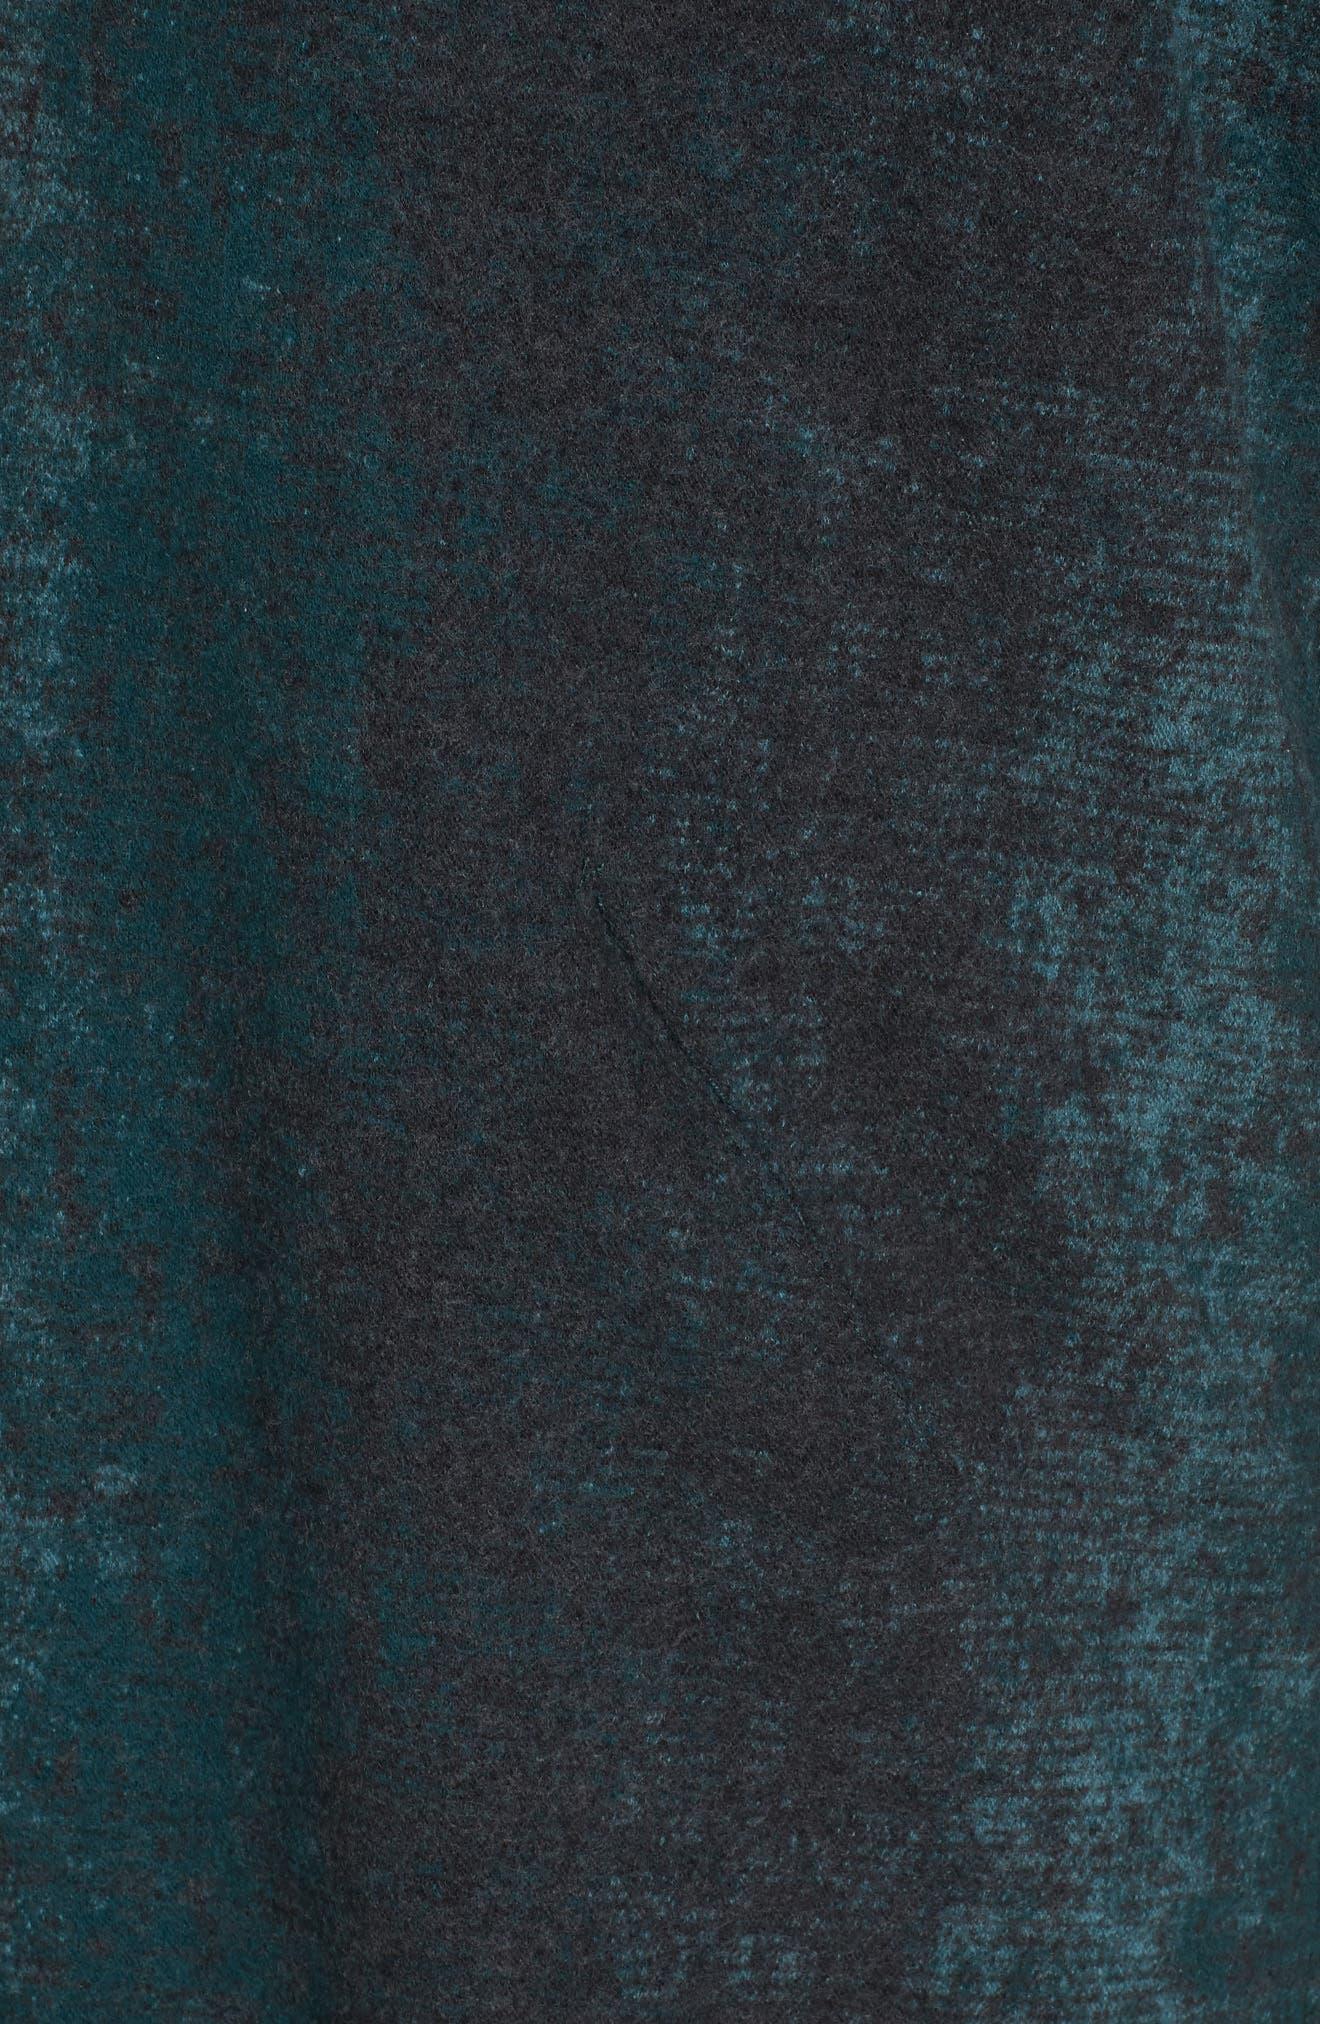 Long Wool Blend Kimono Jacket,                             Alternate thumbnail 7, color,                             PINE